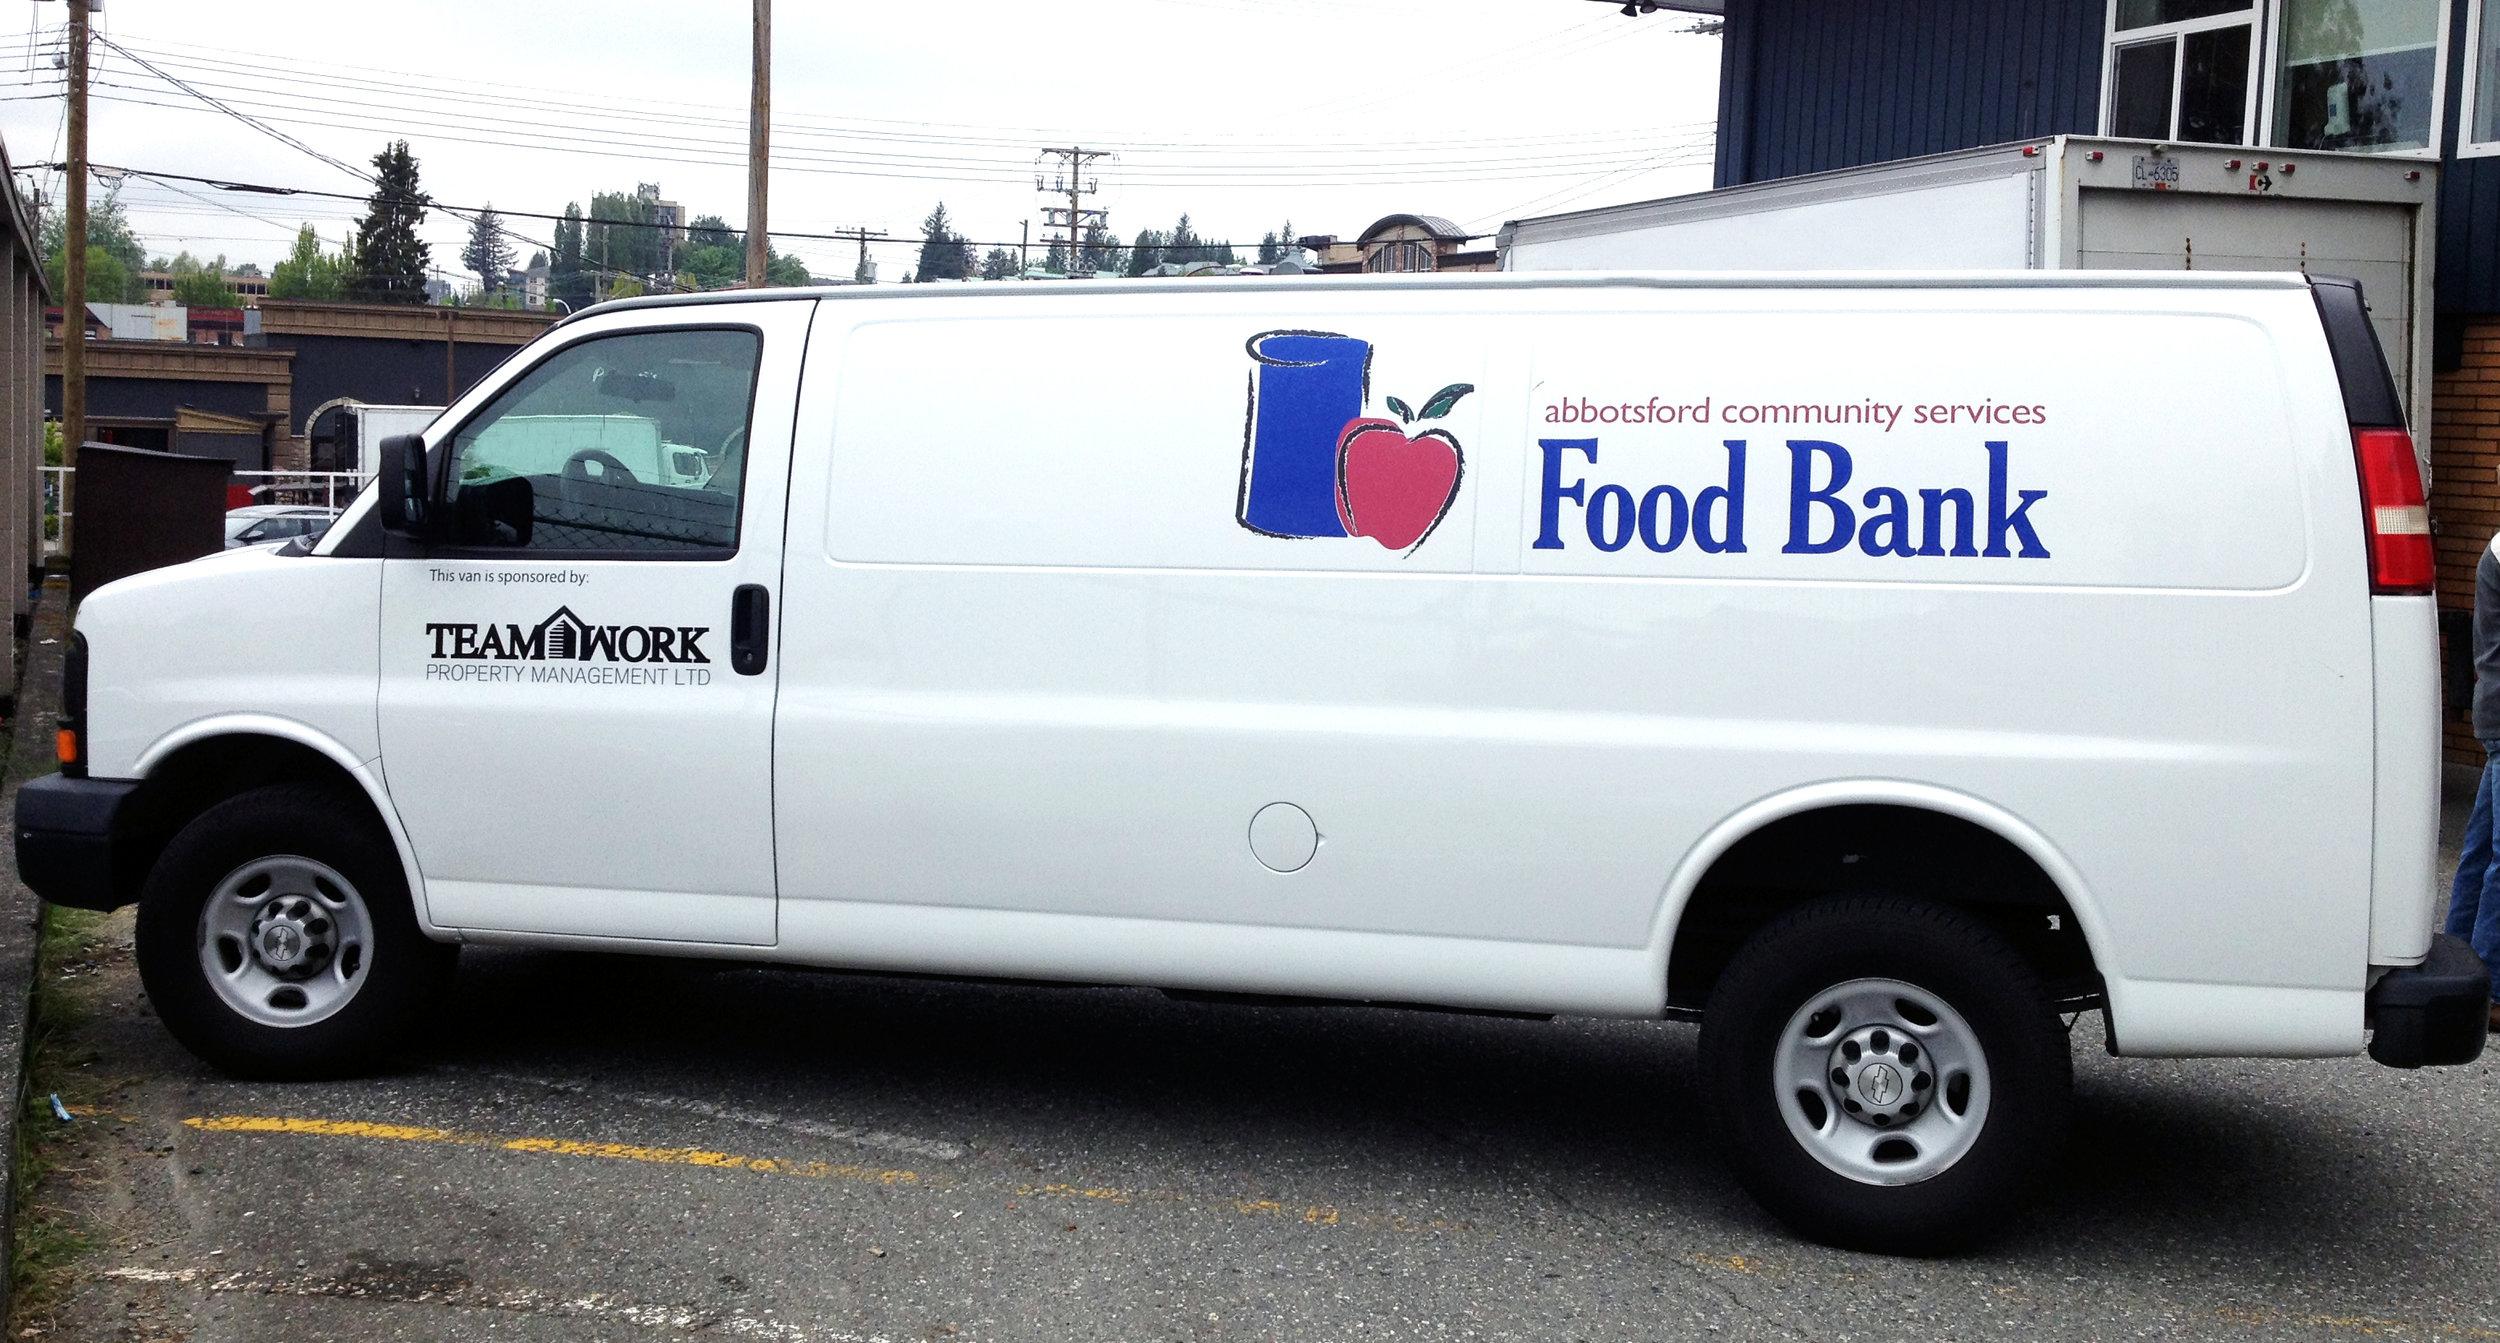 Abbotsford Community Services Food Bank van